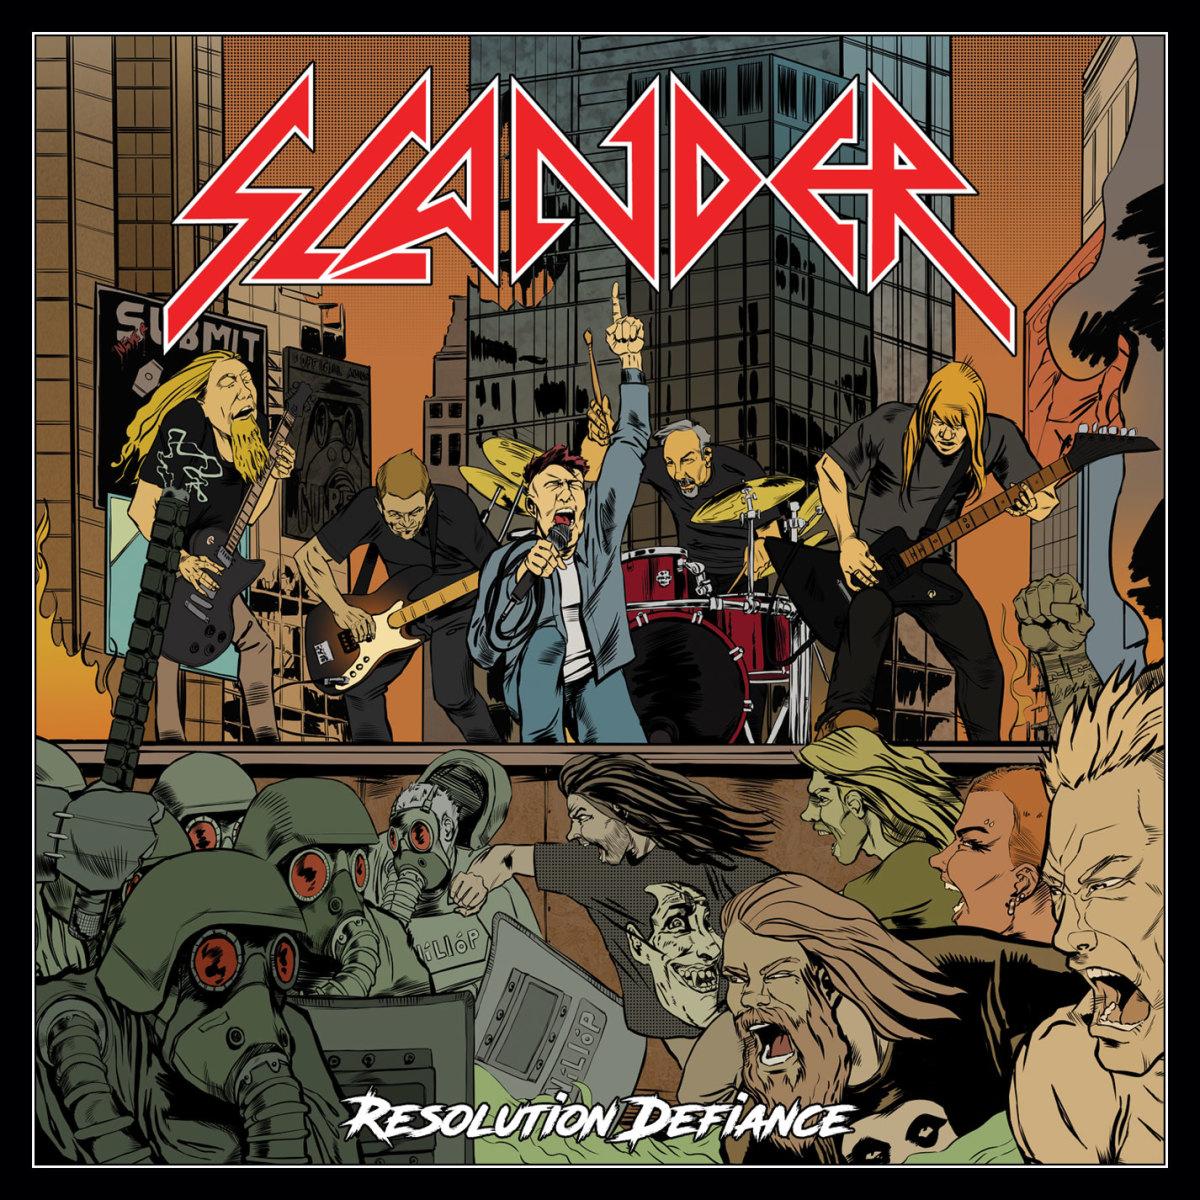 slander-resolution-defiance-2017-album-review